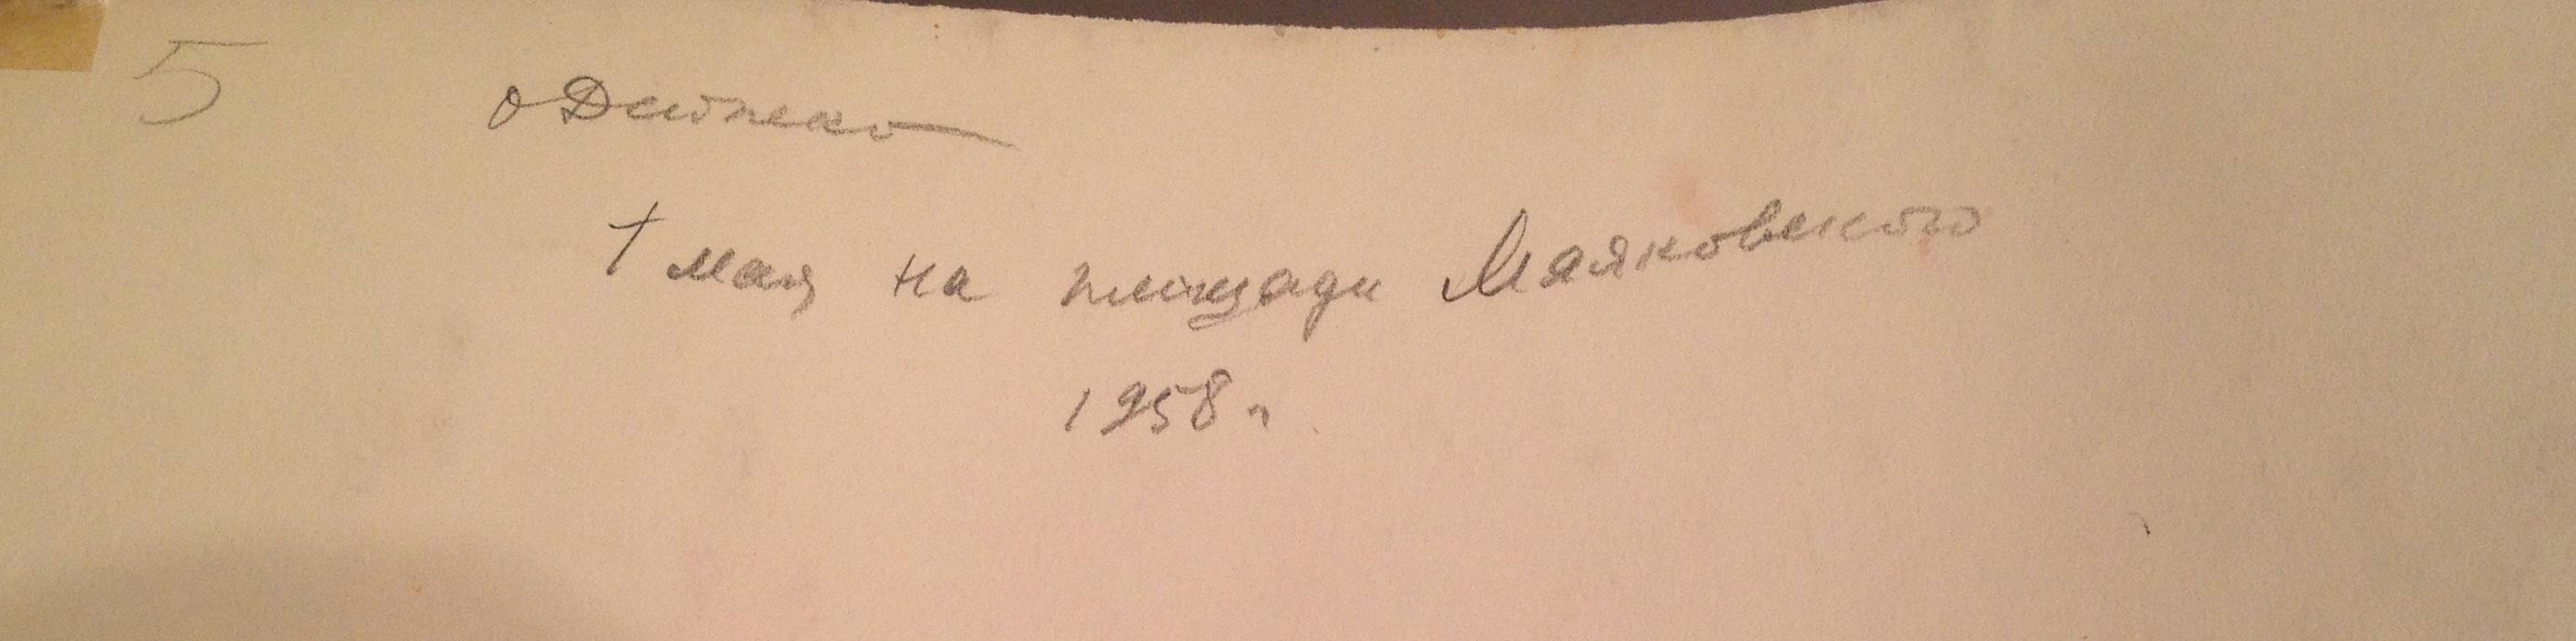 Оборот. Дейнеко Ольга Константиновна. 1 мая на площади Маяковского.